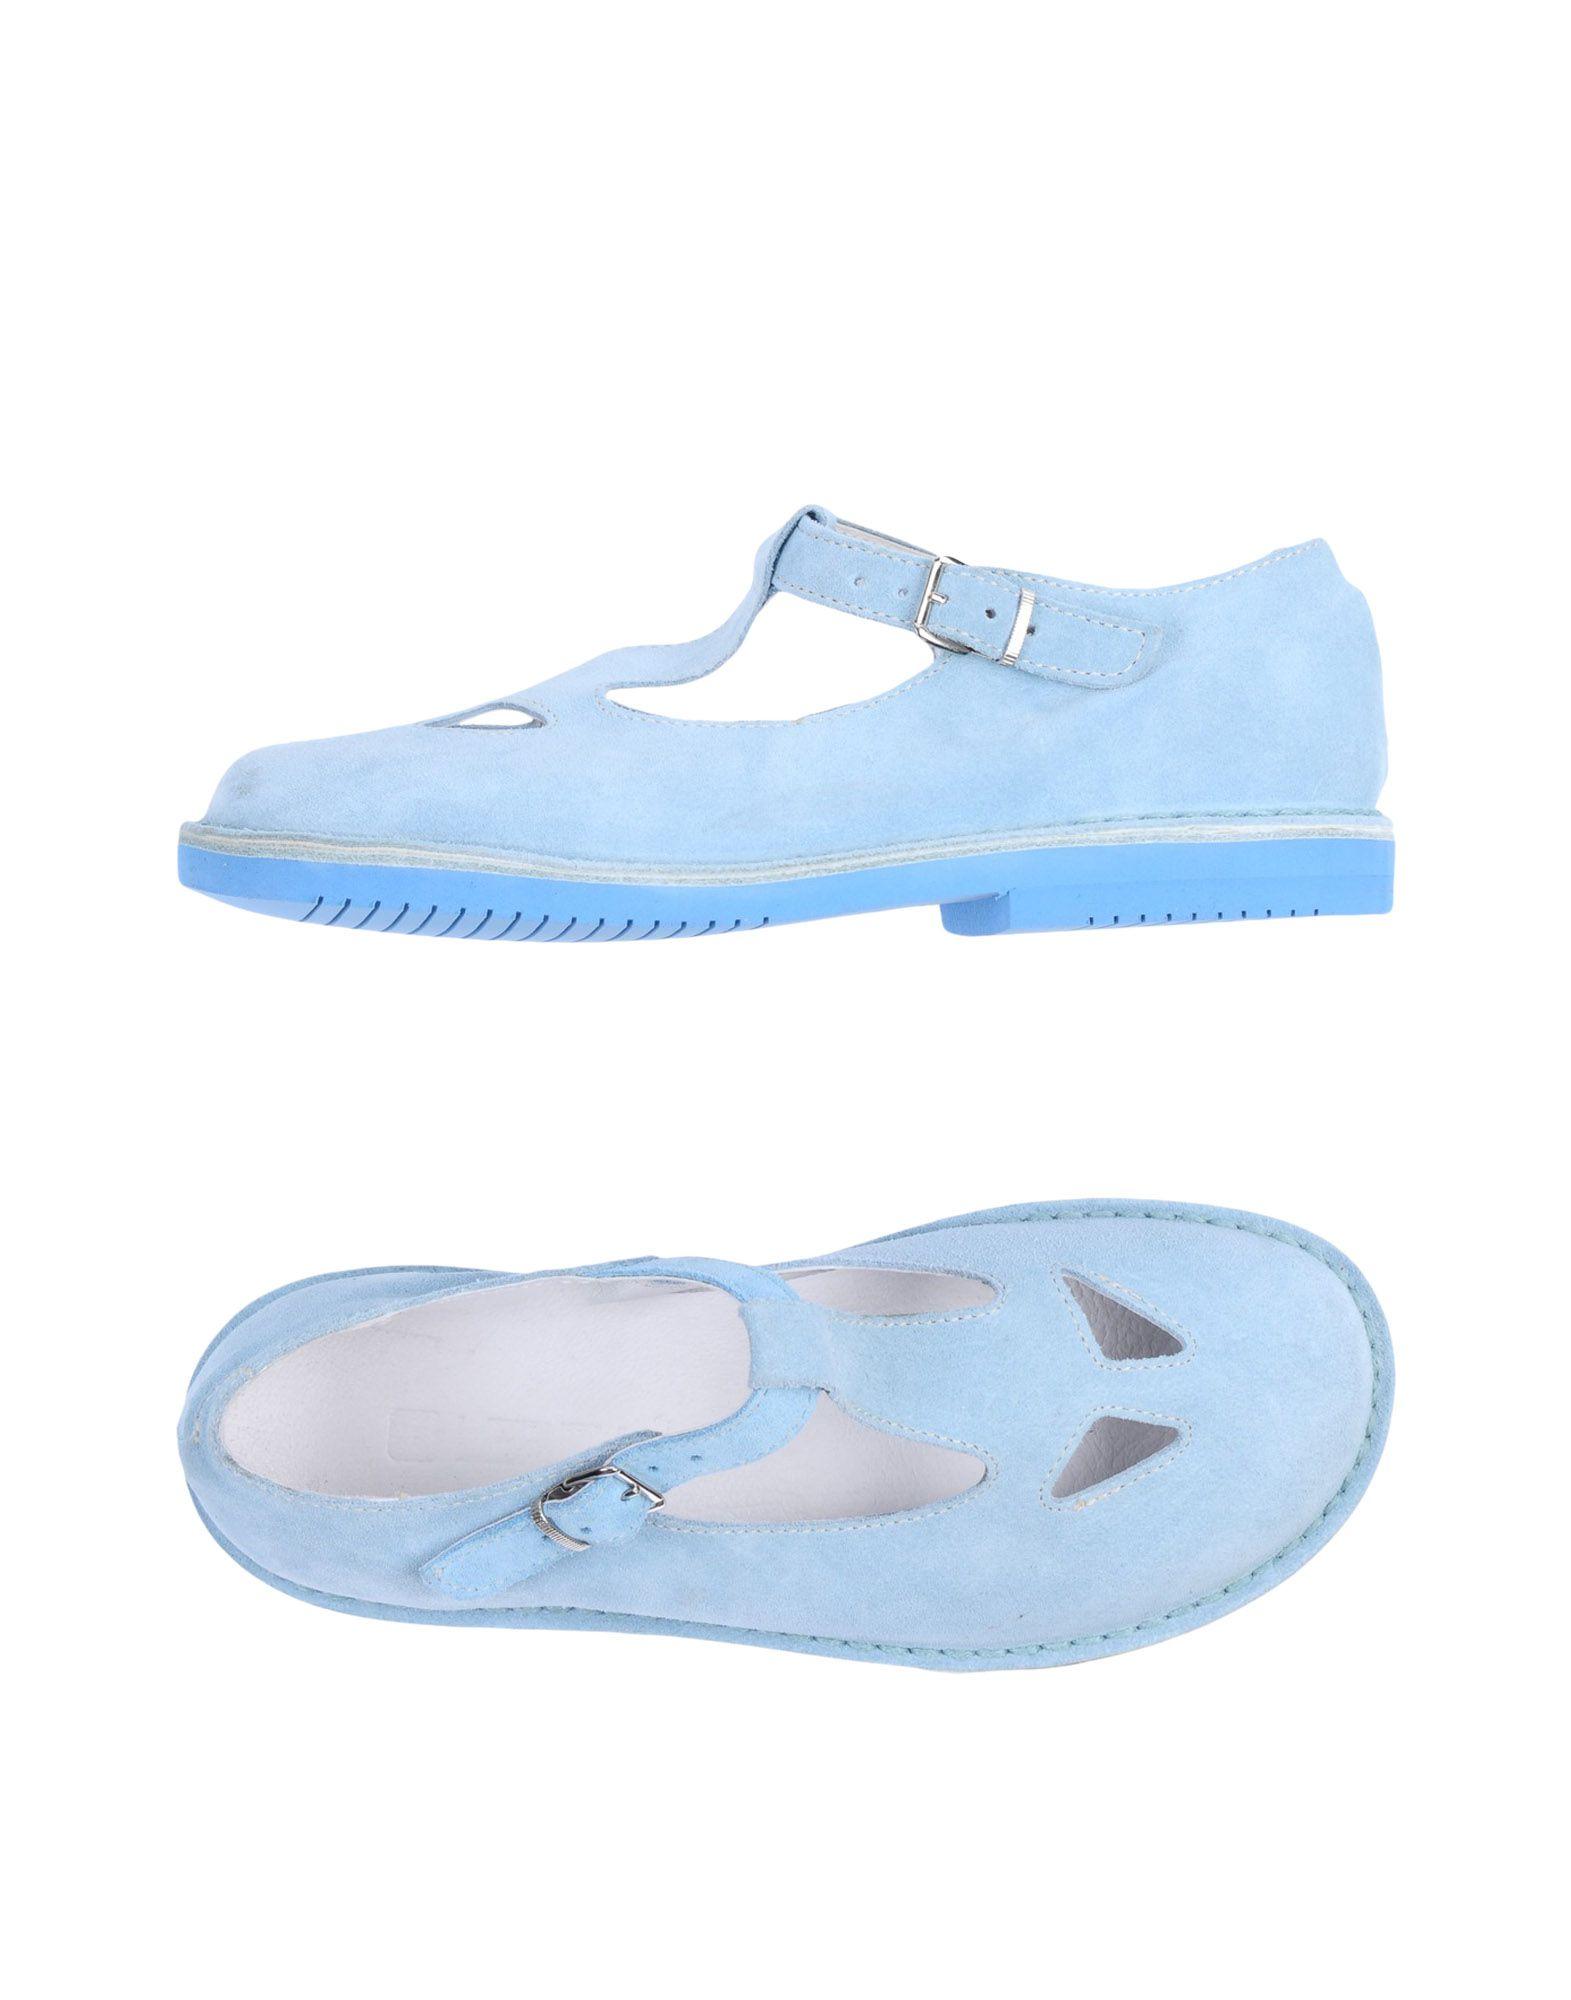 Lerews Dianetten Damen  11408851OW Gute Qualität beliebte Schuhe